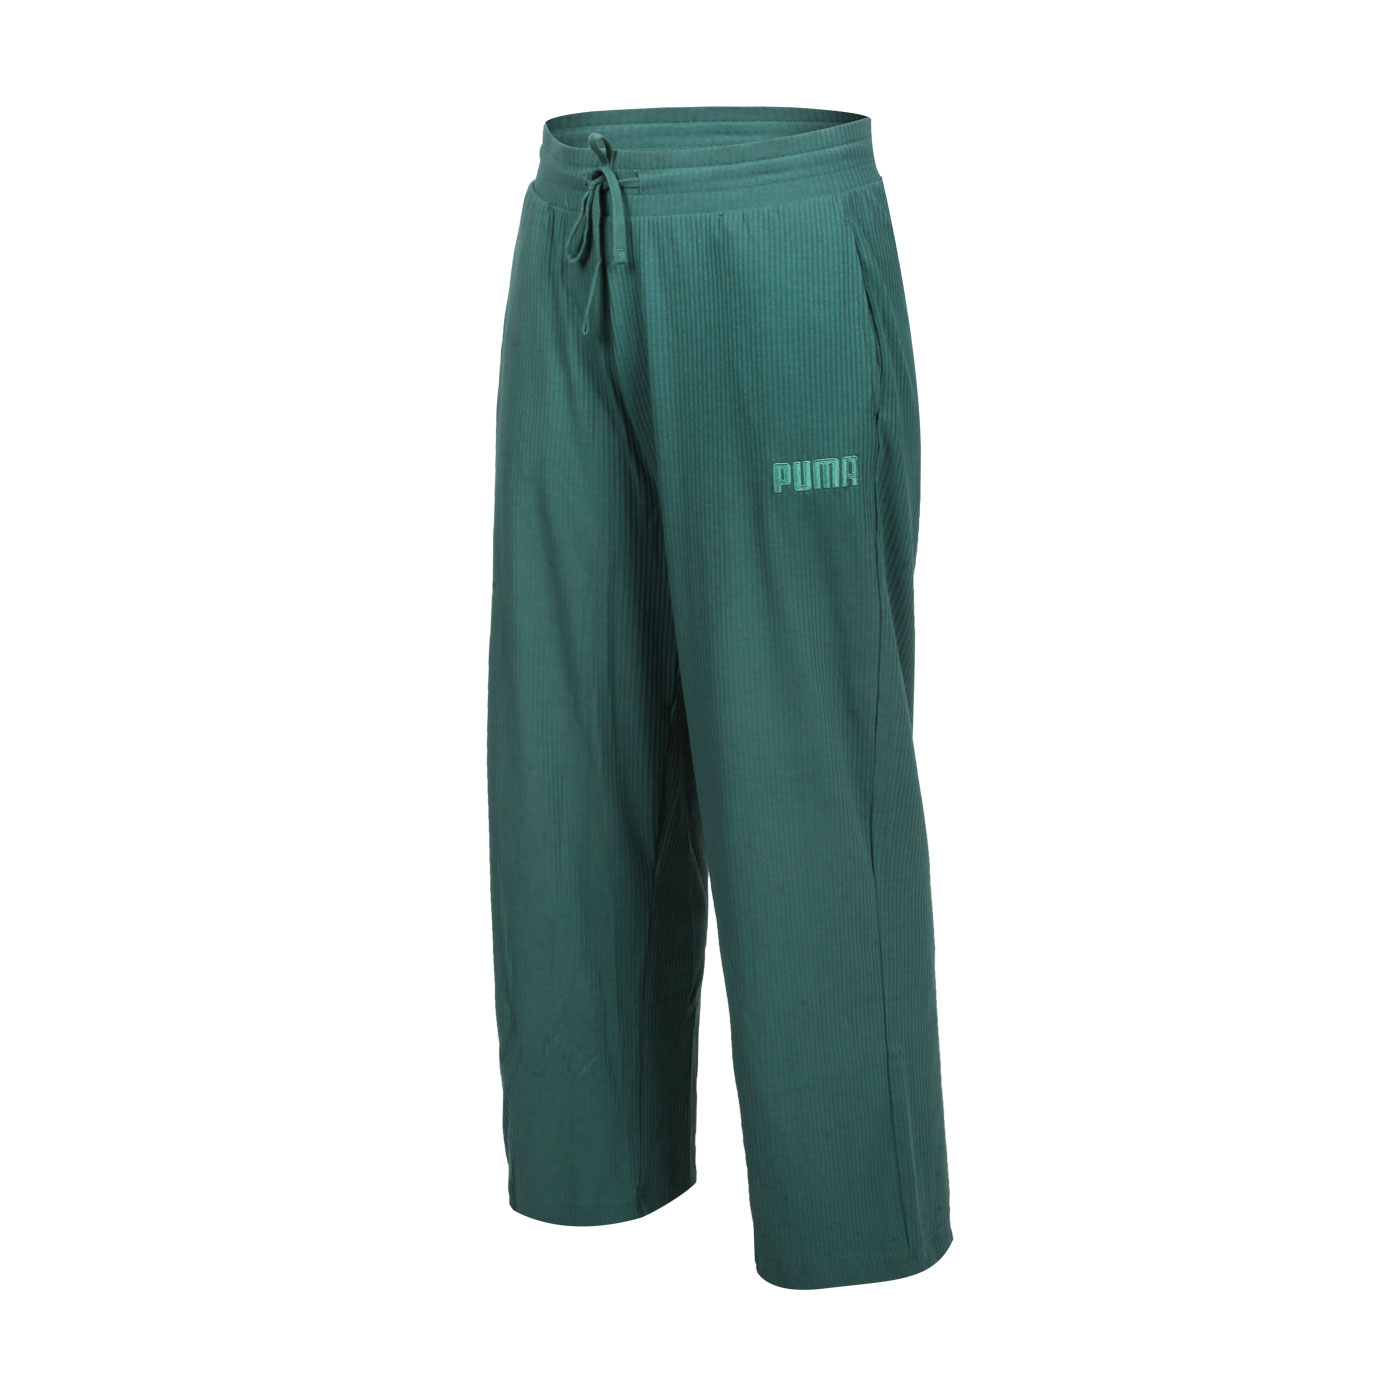 PUMA 女款基本系列Modern Basics羅紋寬褲 58593845